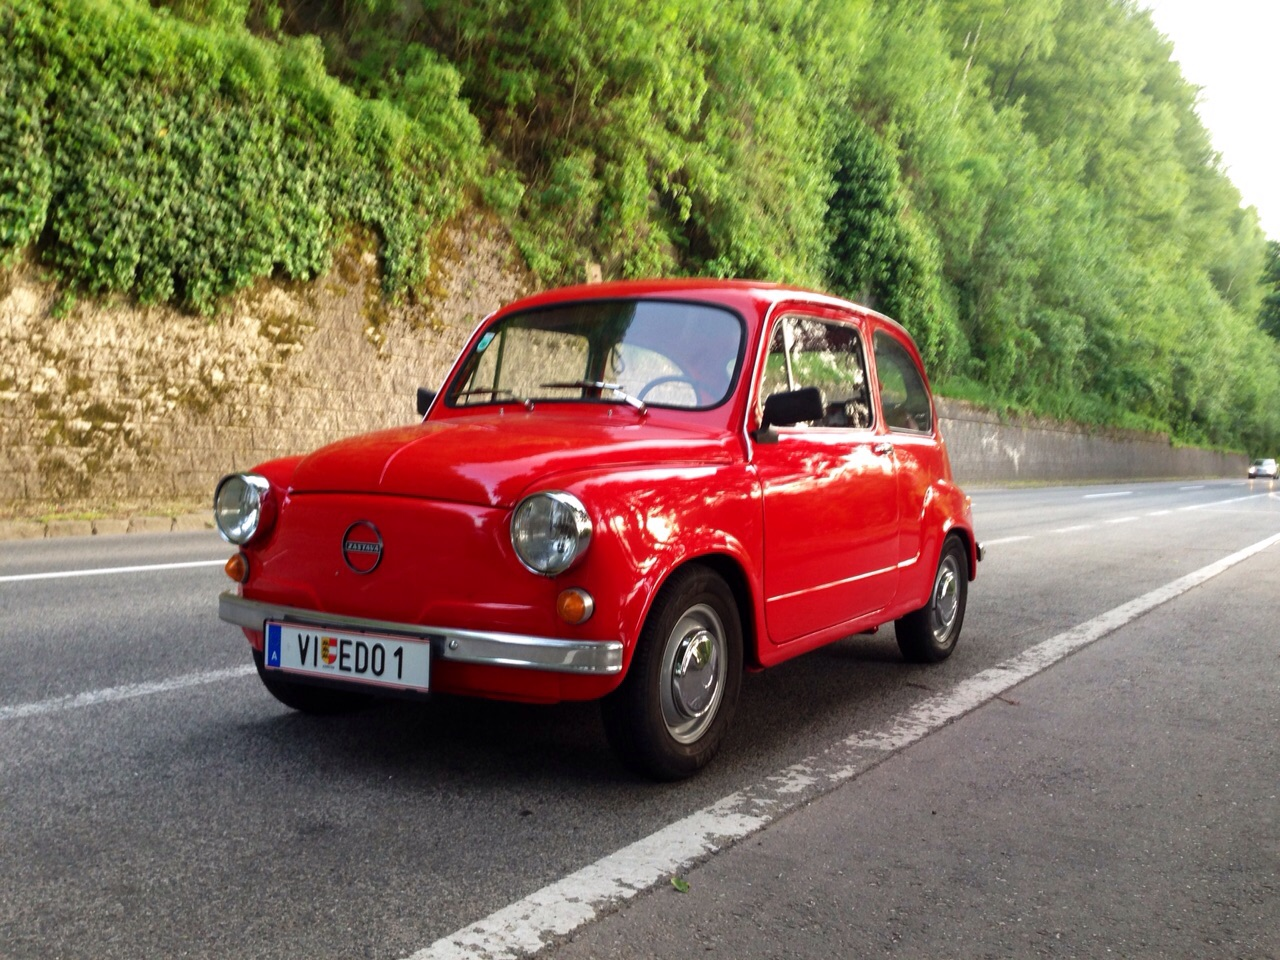 Zastava 750 Pics, Vehicles Collection